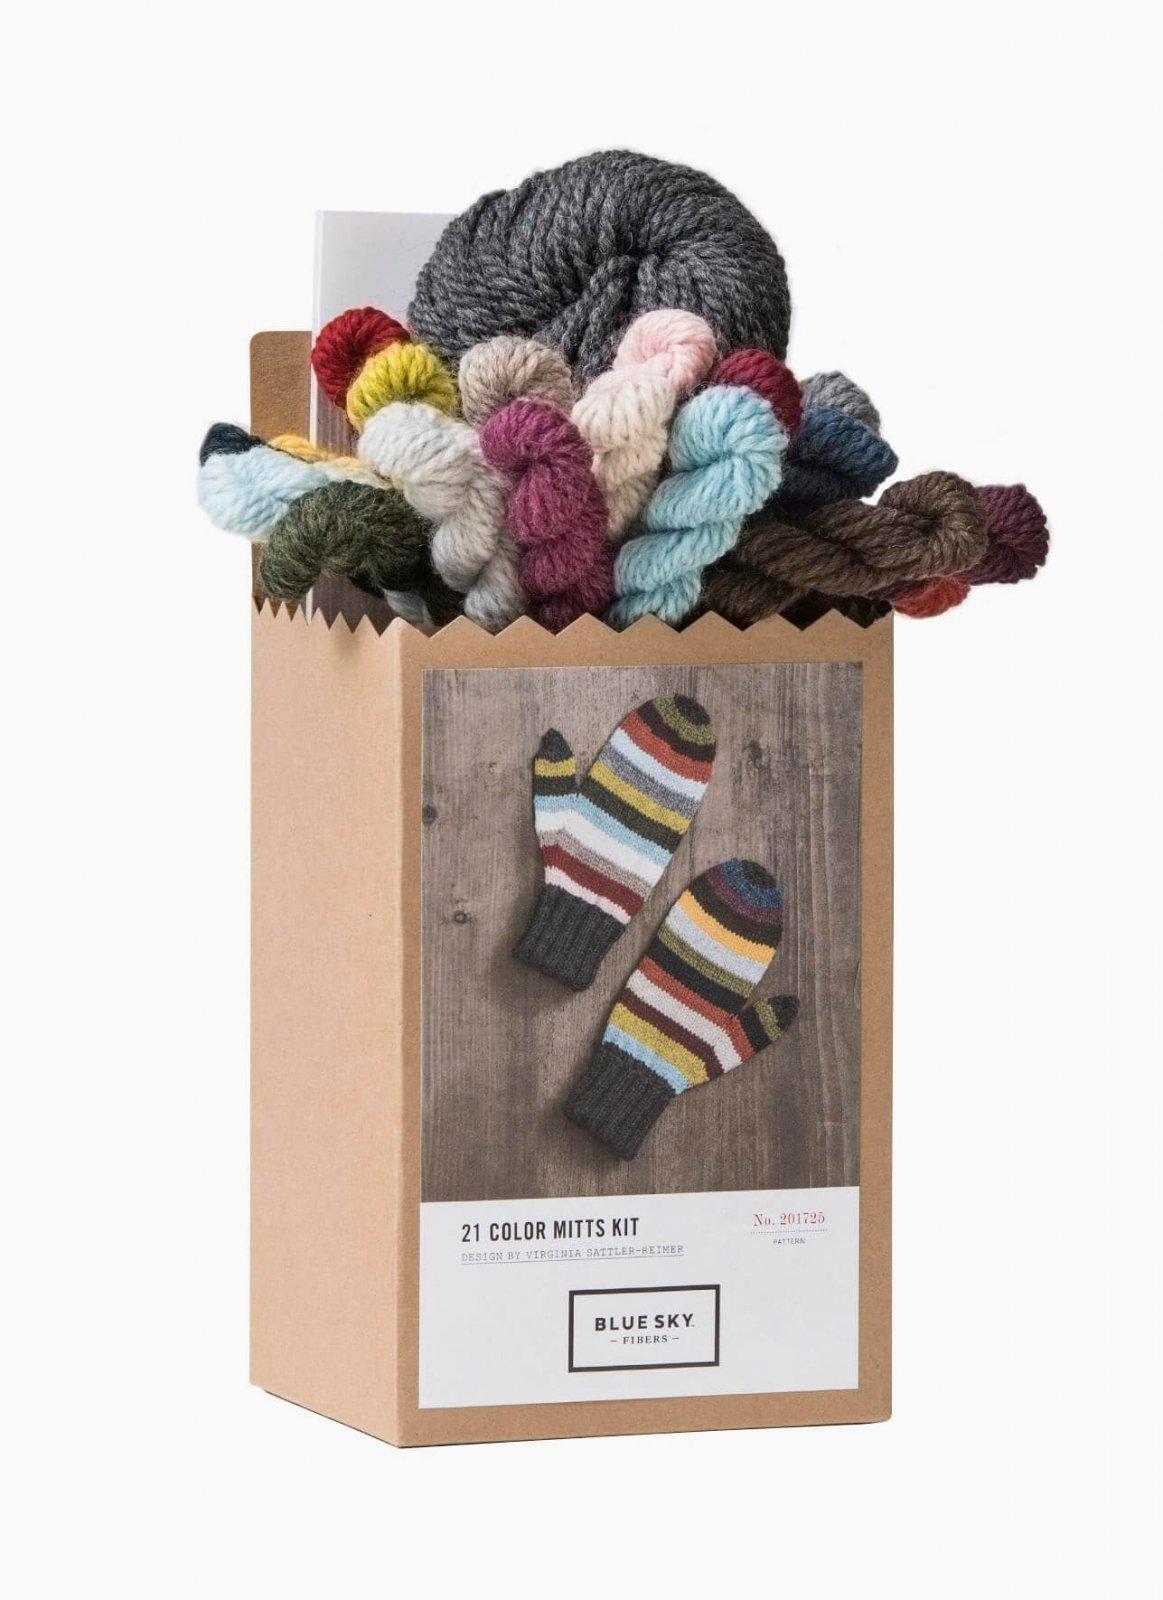 Blue Sky Fibers - 21 Color Mittens Kit - Woolstok